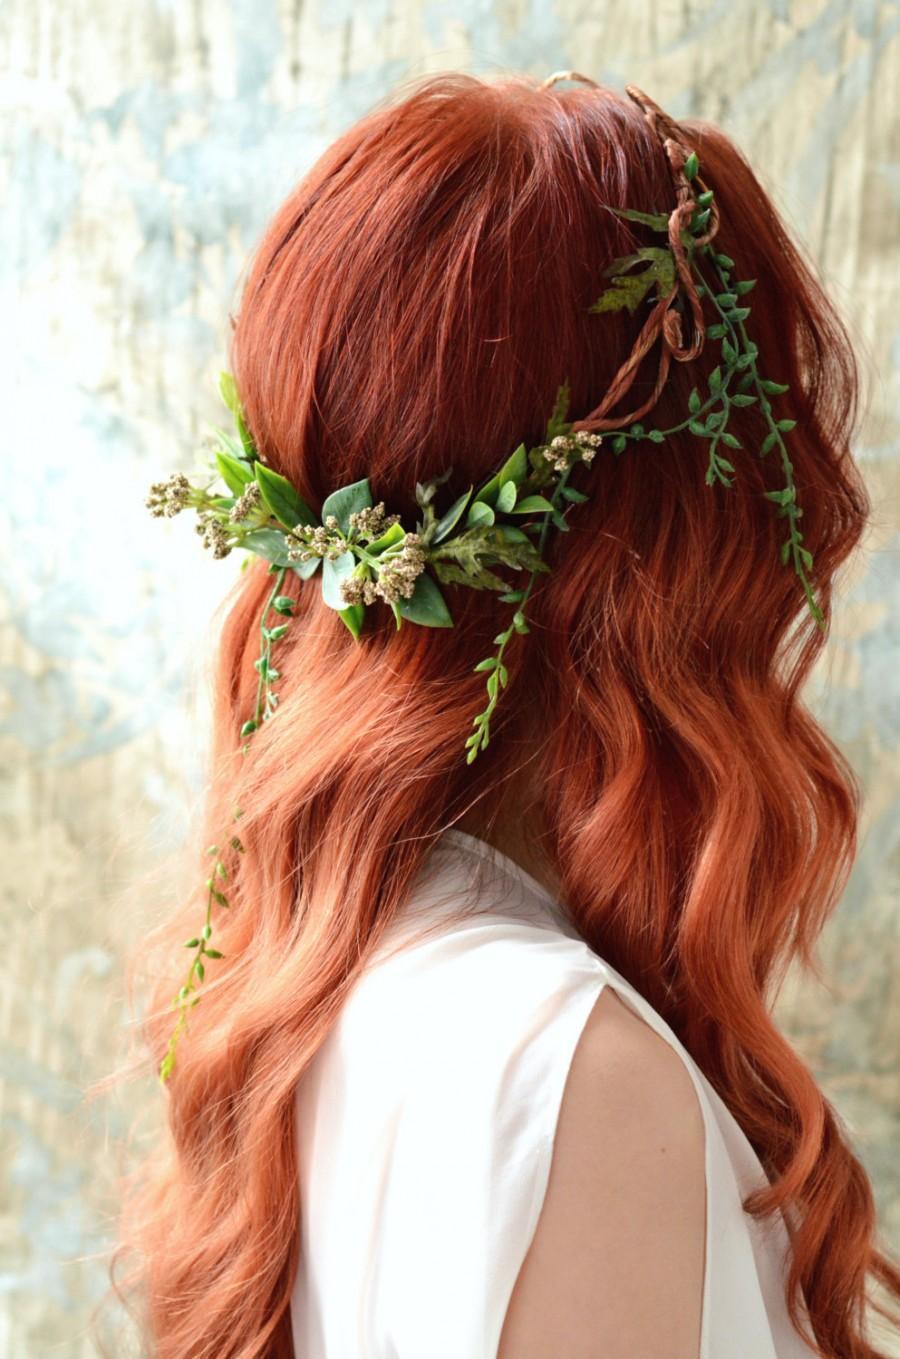 Hochzeit - Goddess leaf crown, Woodland headpiece, Forest crown, Leaf circlet, Rustic wedding, Hair accessories